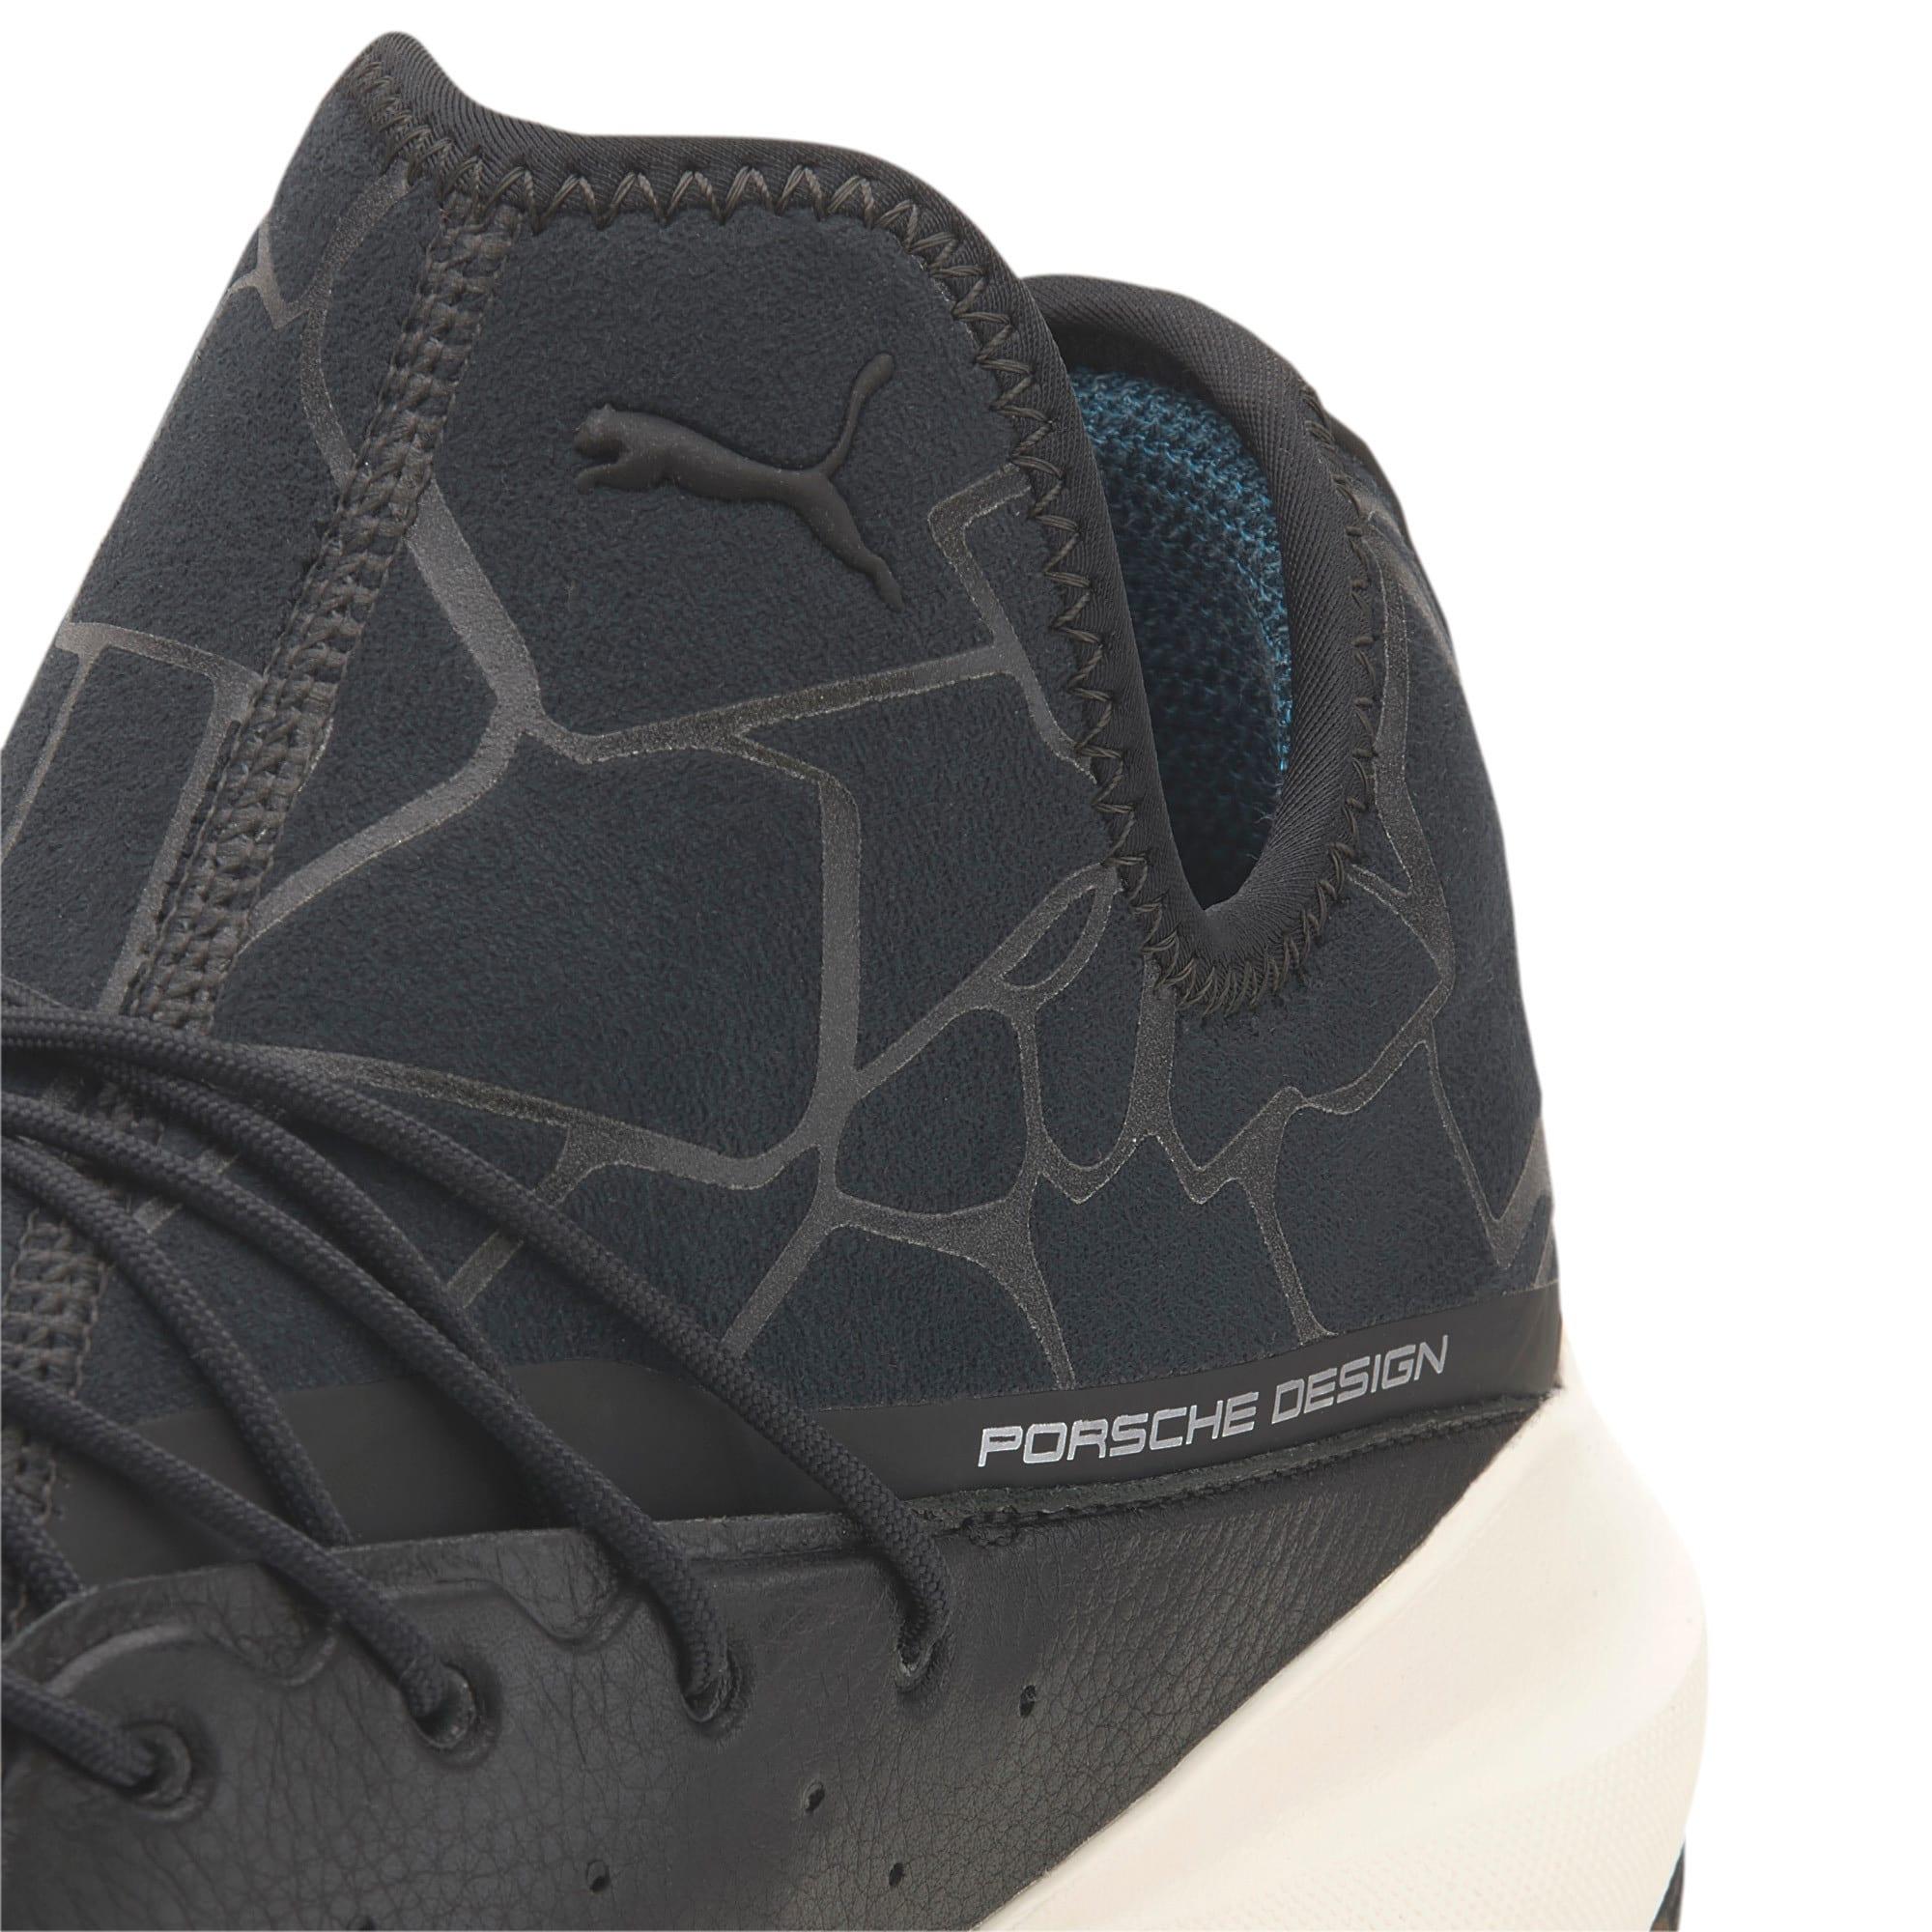 Imagen en miniatura 8 de Zapatillas de hombre Porsche Design Evo Cat II, JetBlack-JetBlack-WhisperWht, mediana